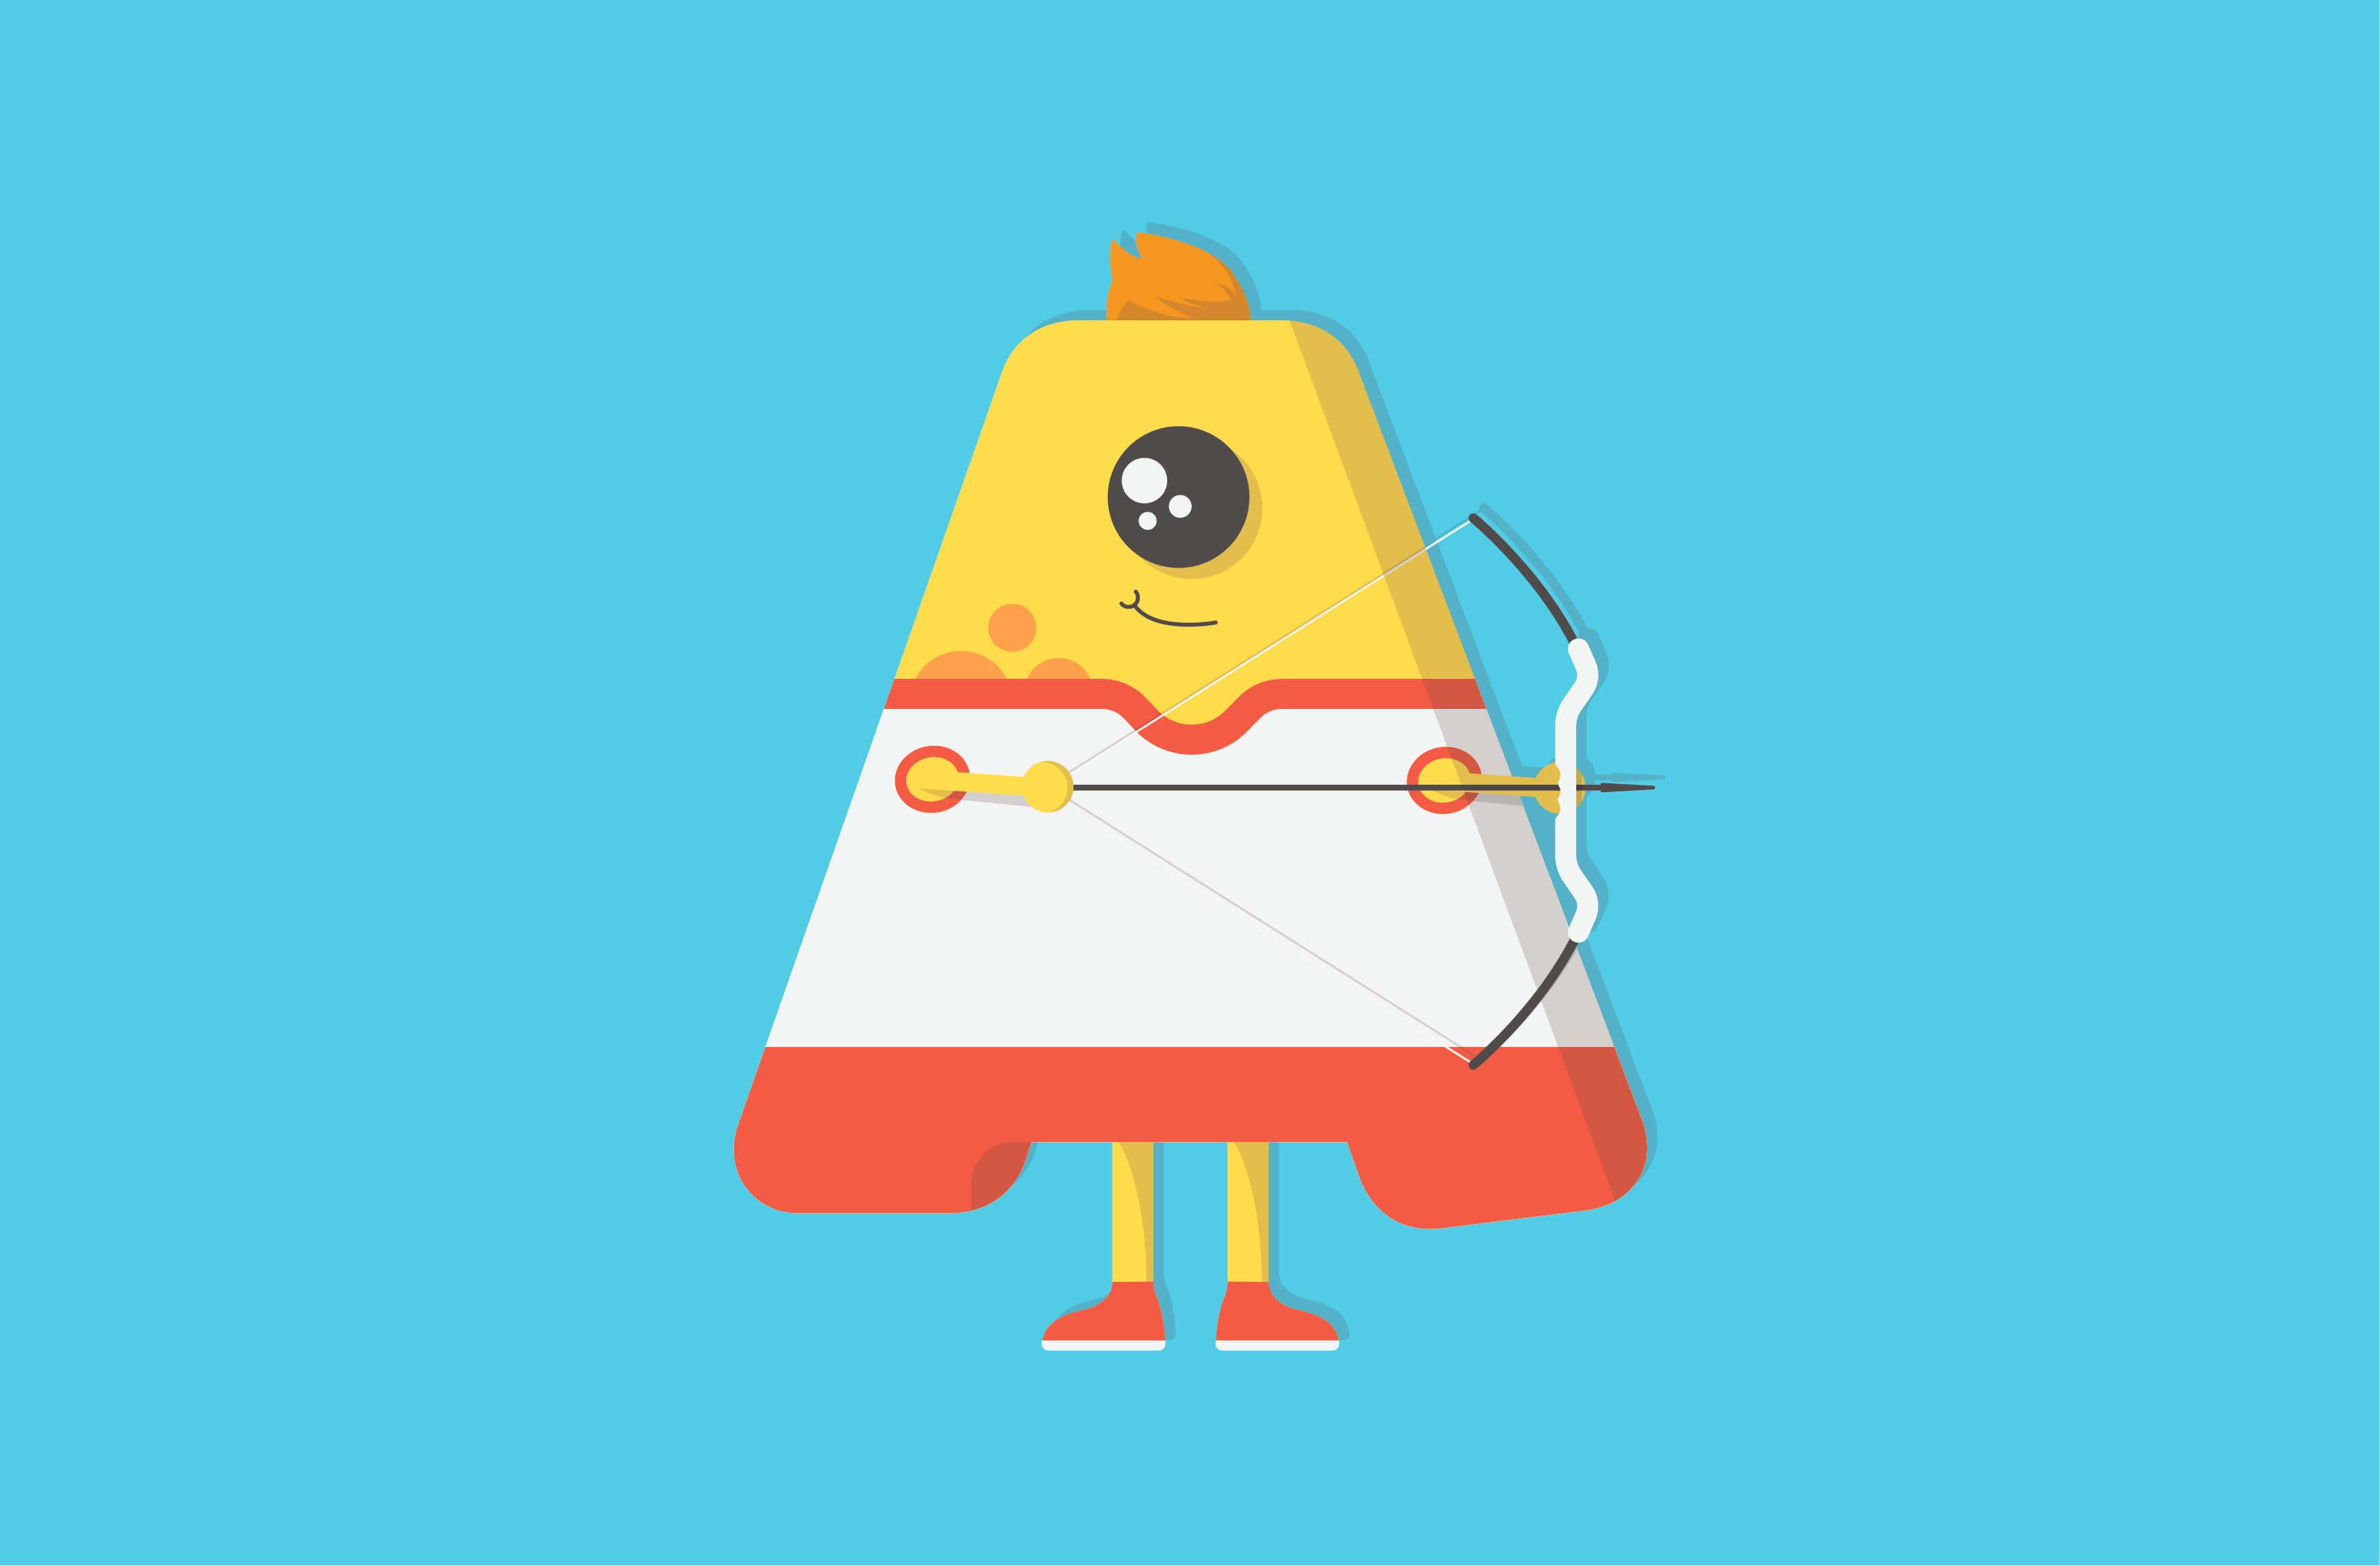 Archery monster character illustration